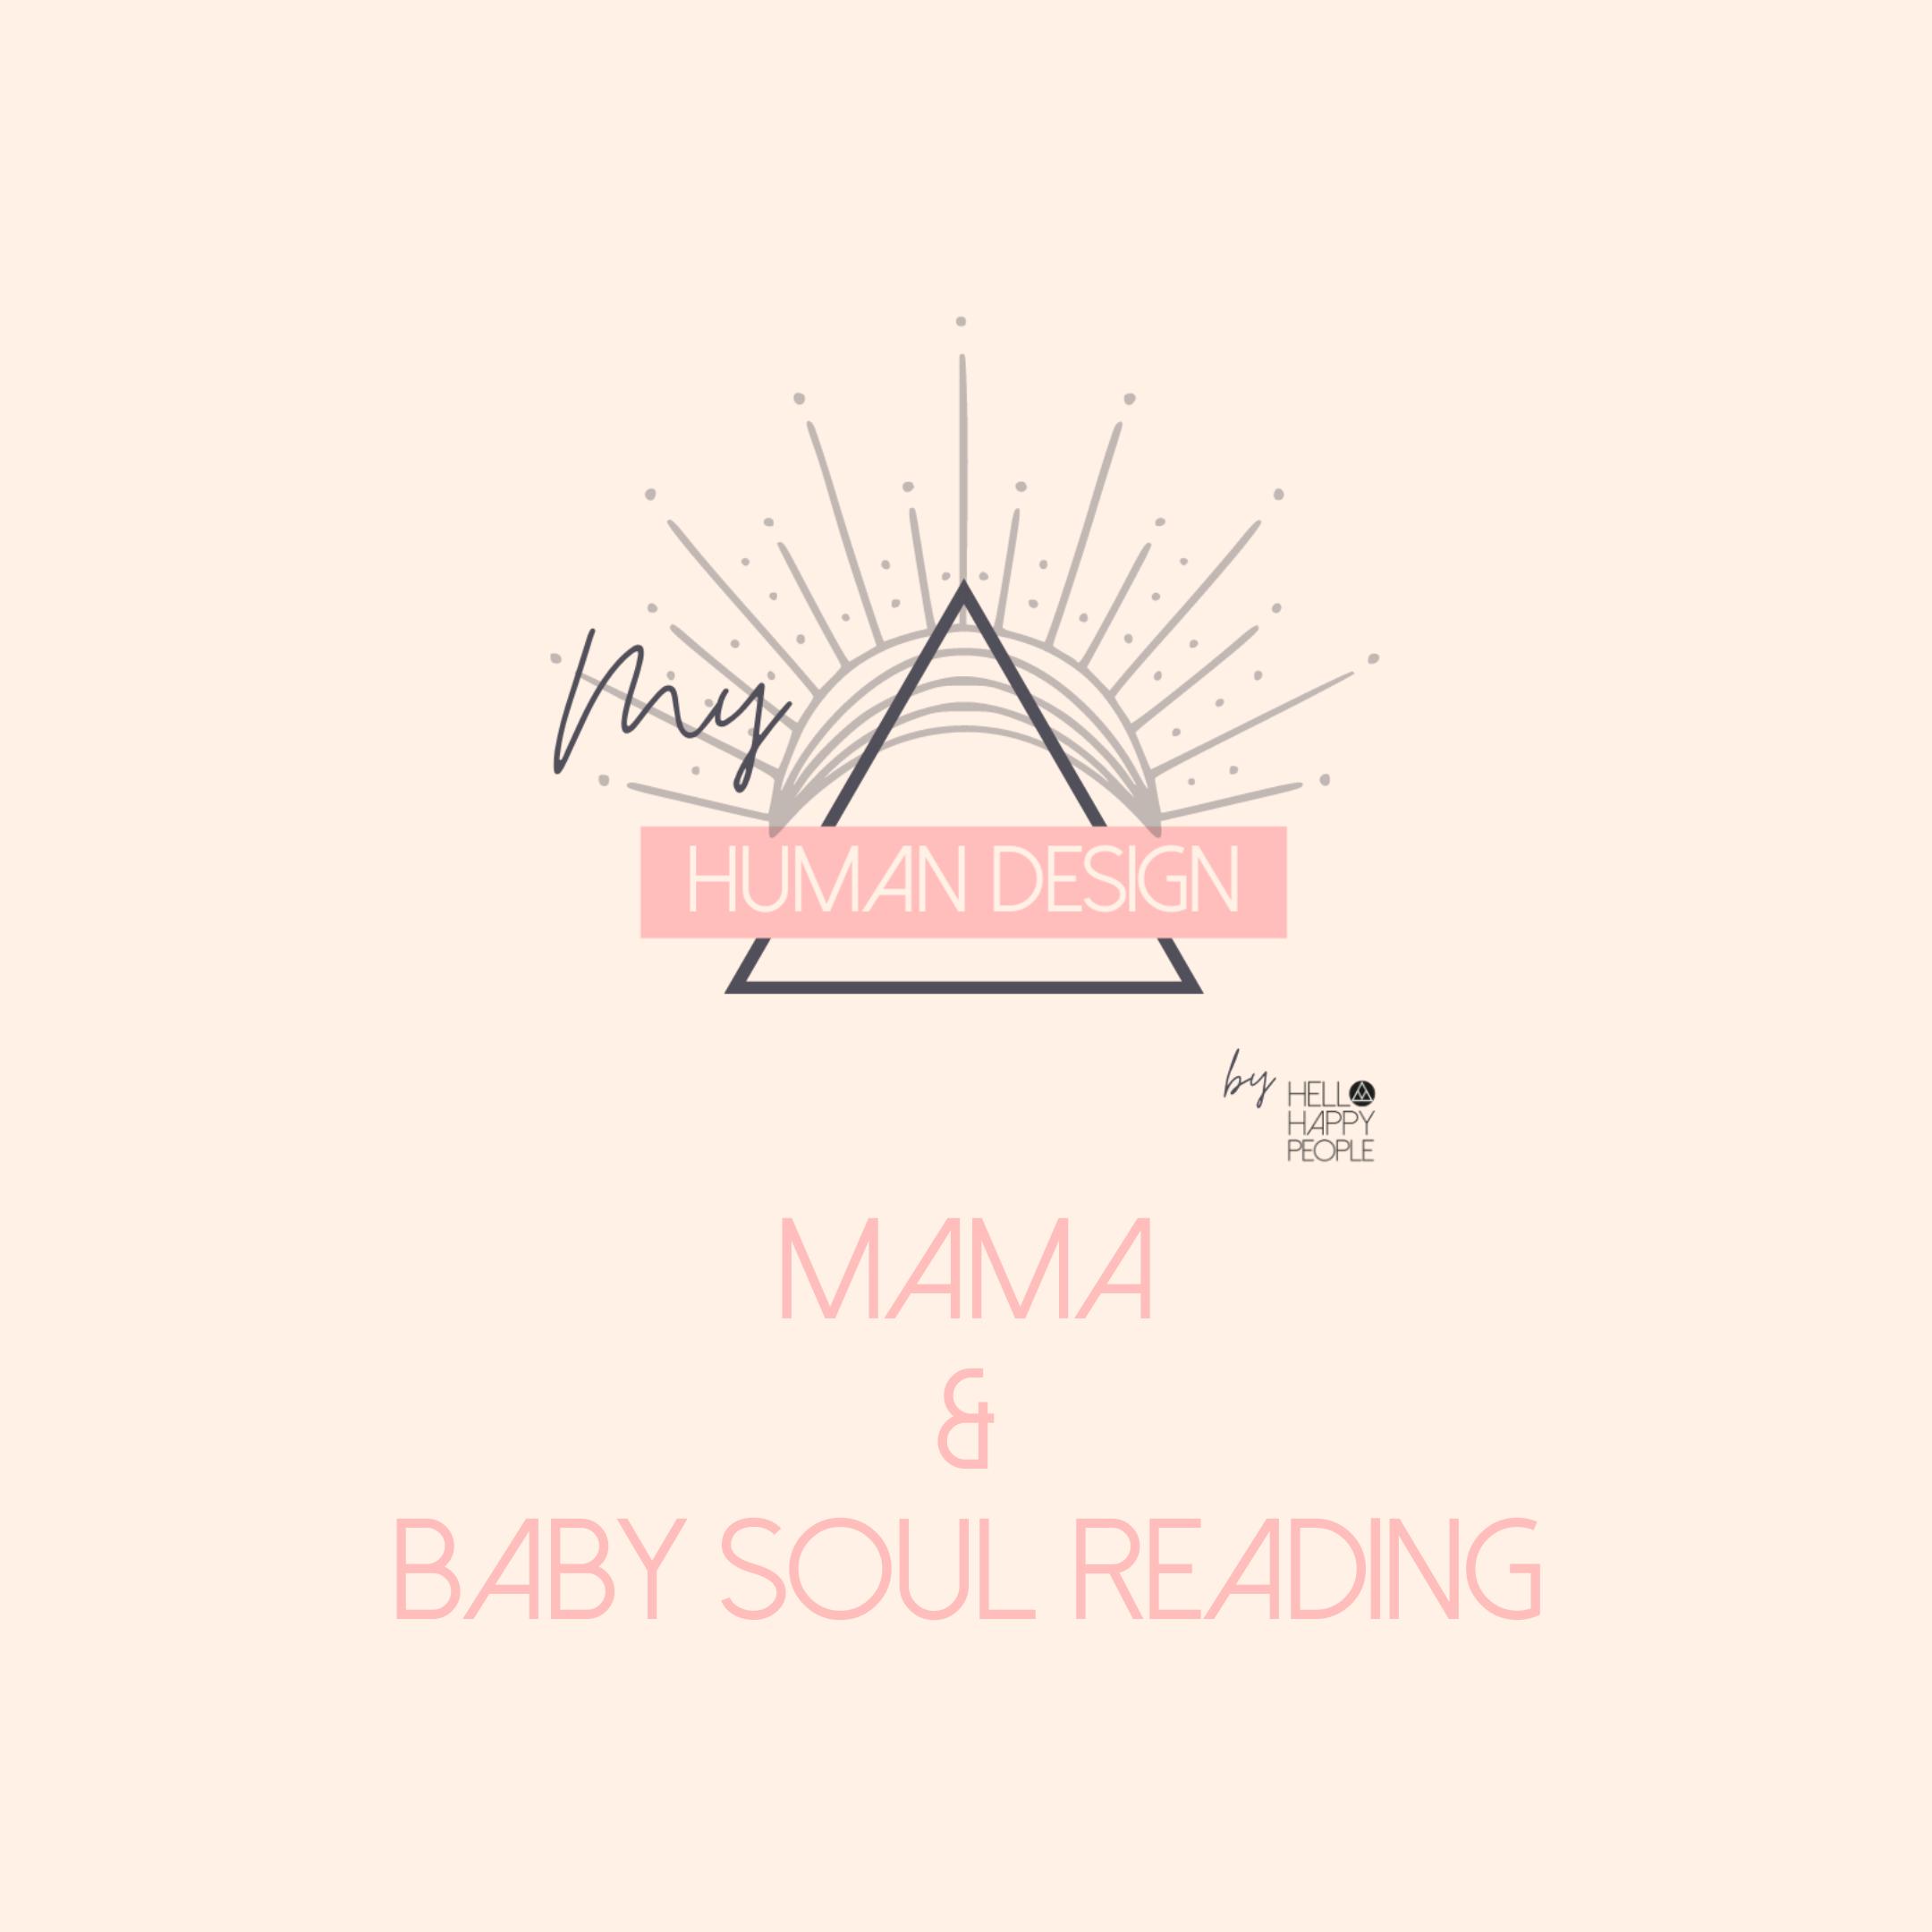 MAMA & BABY SOUL READING